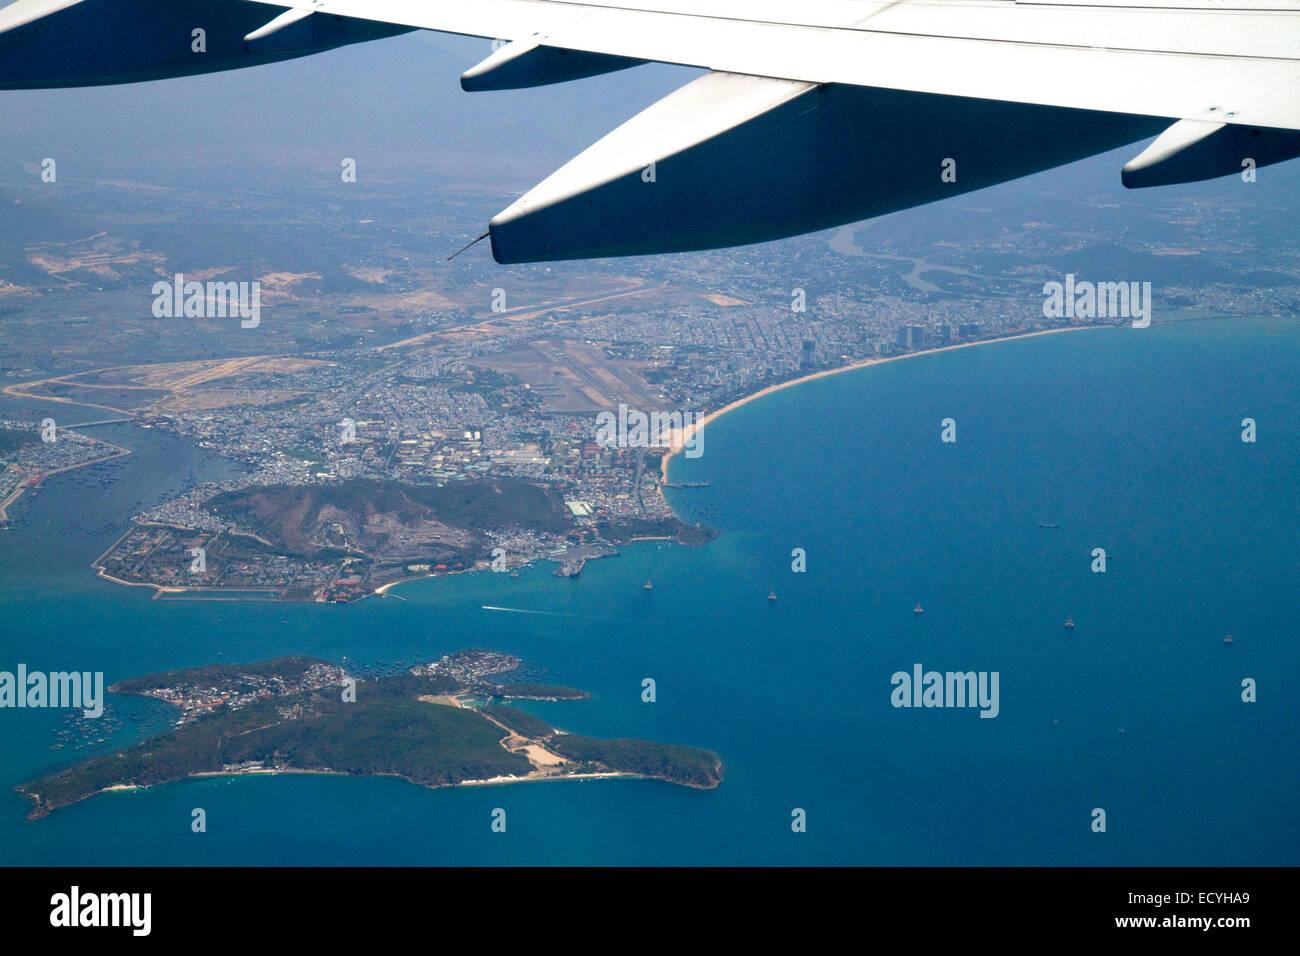 Aerial view of the South China Sea near Nha Trang, Vietnam. - Stock Image